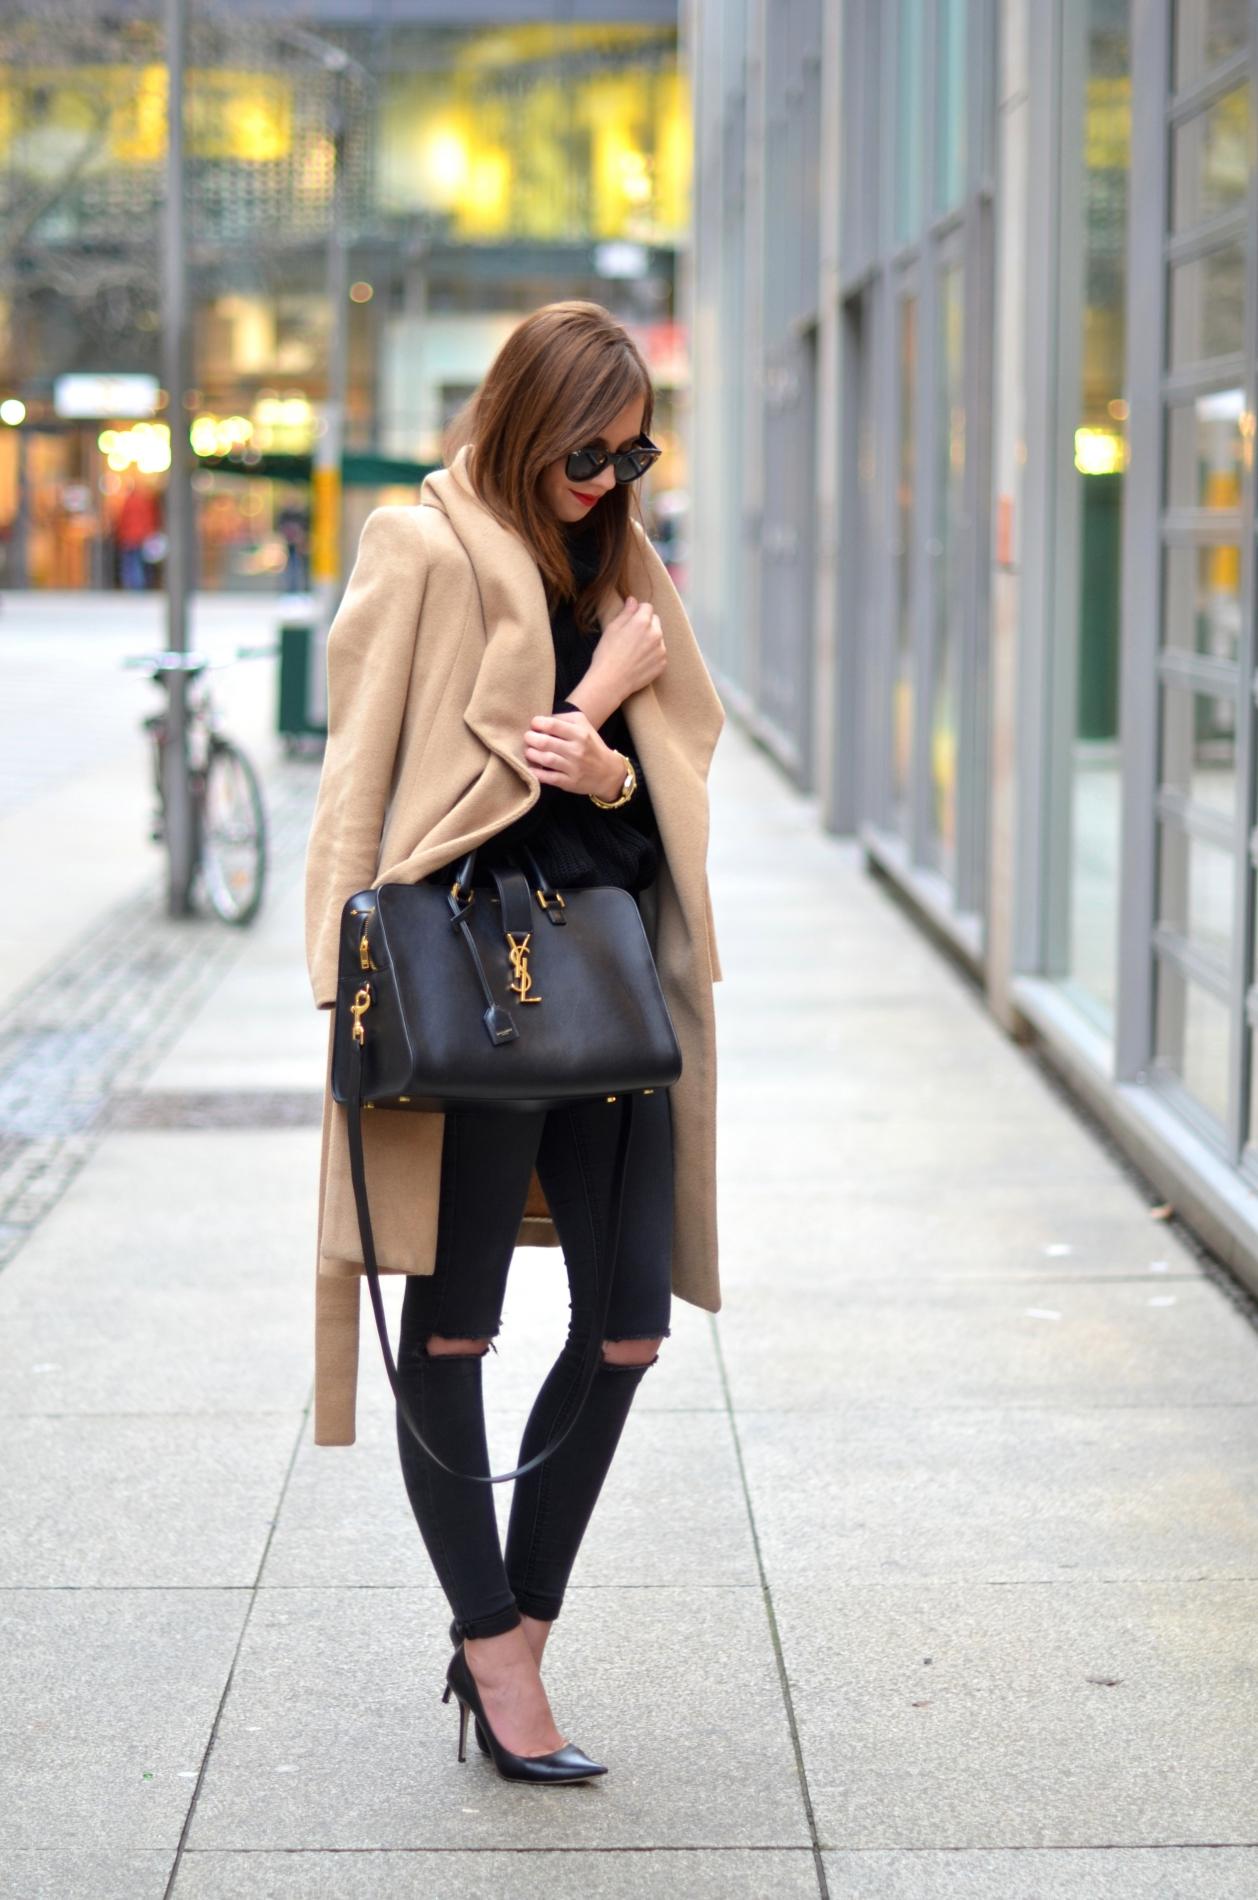 Grabbing Cute Fall Outfits for Women